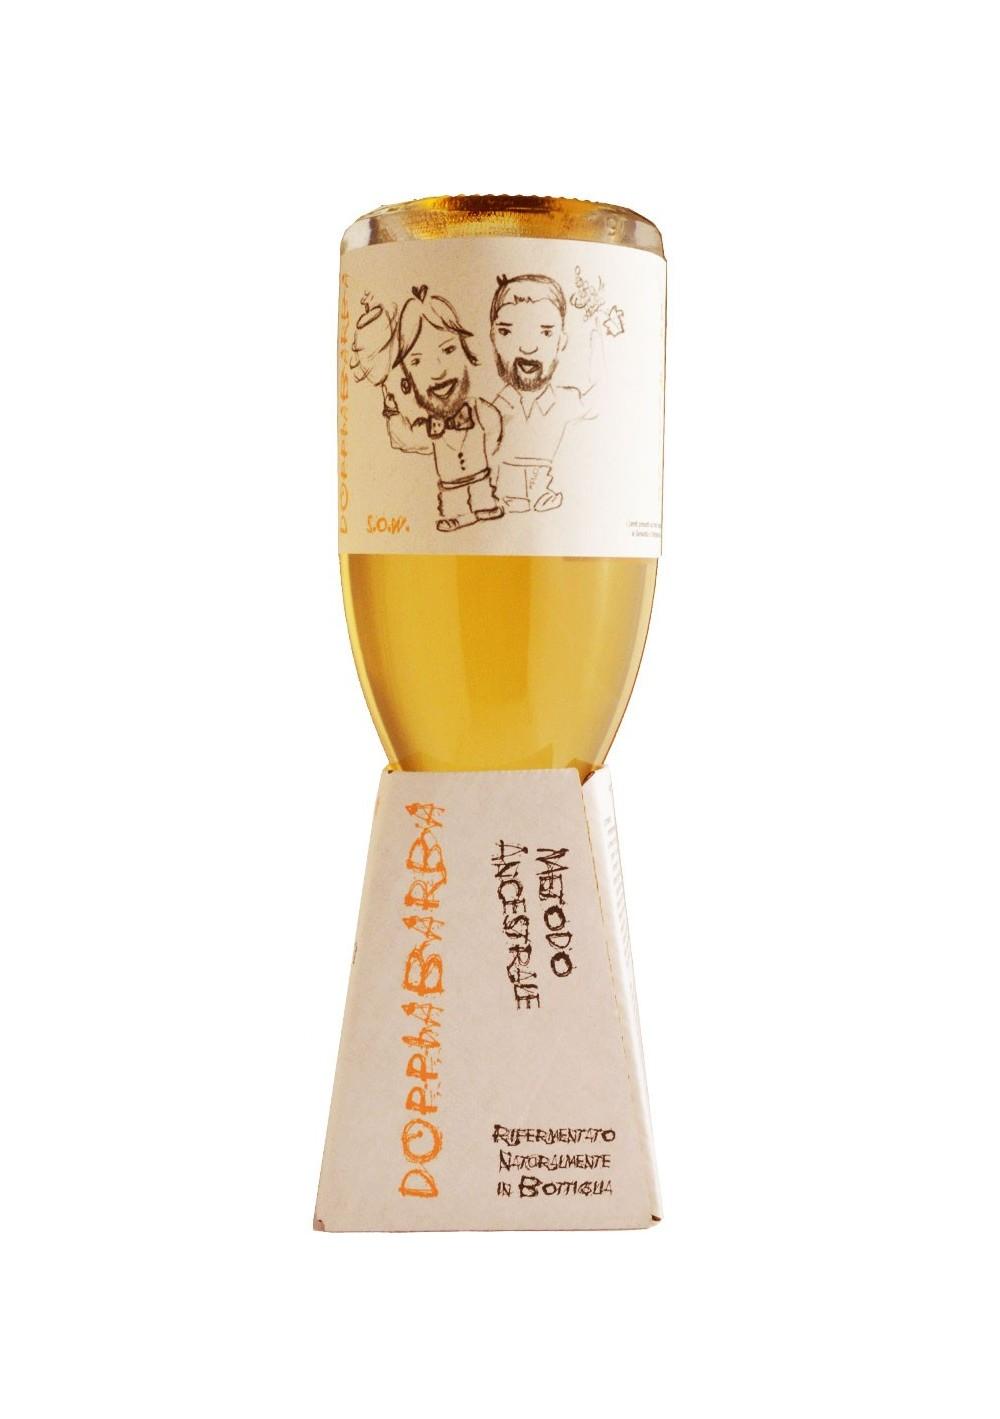 Doppiabarba, Sparkling Orange Wine - Marina Palusci